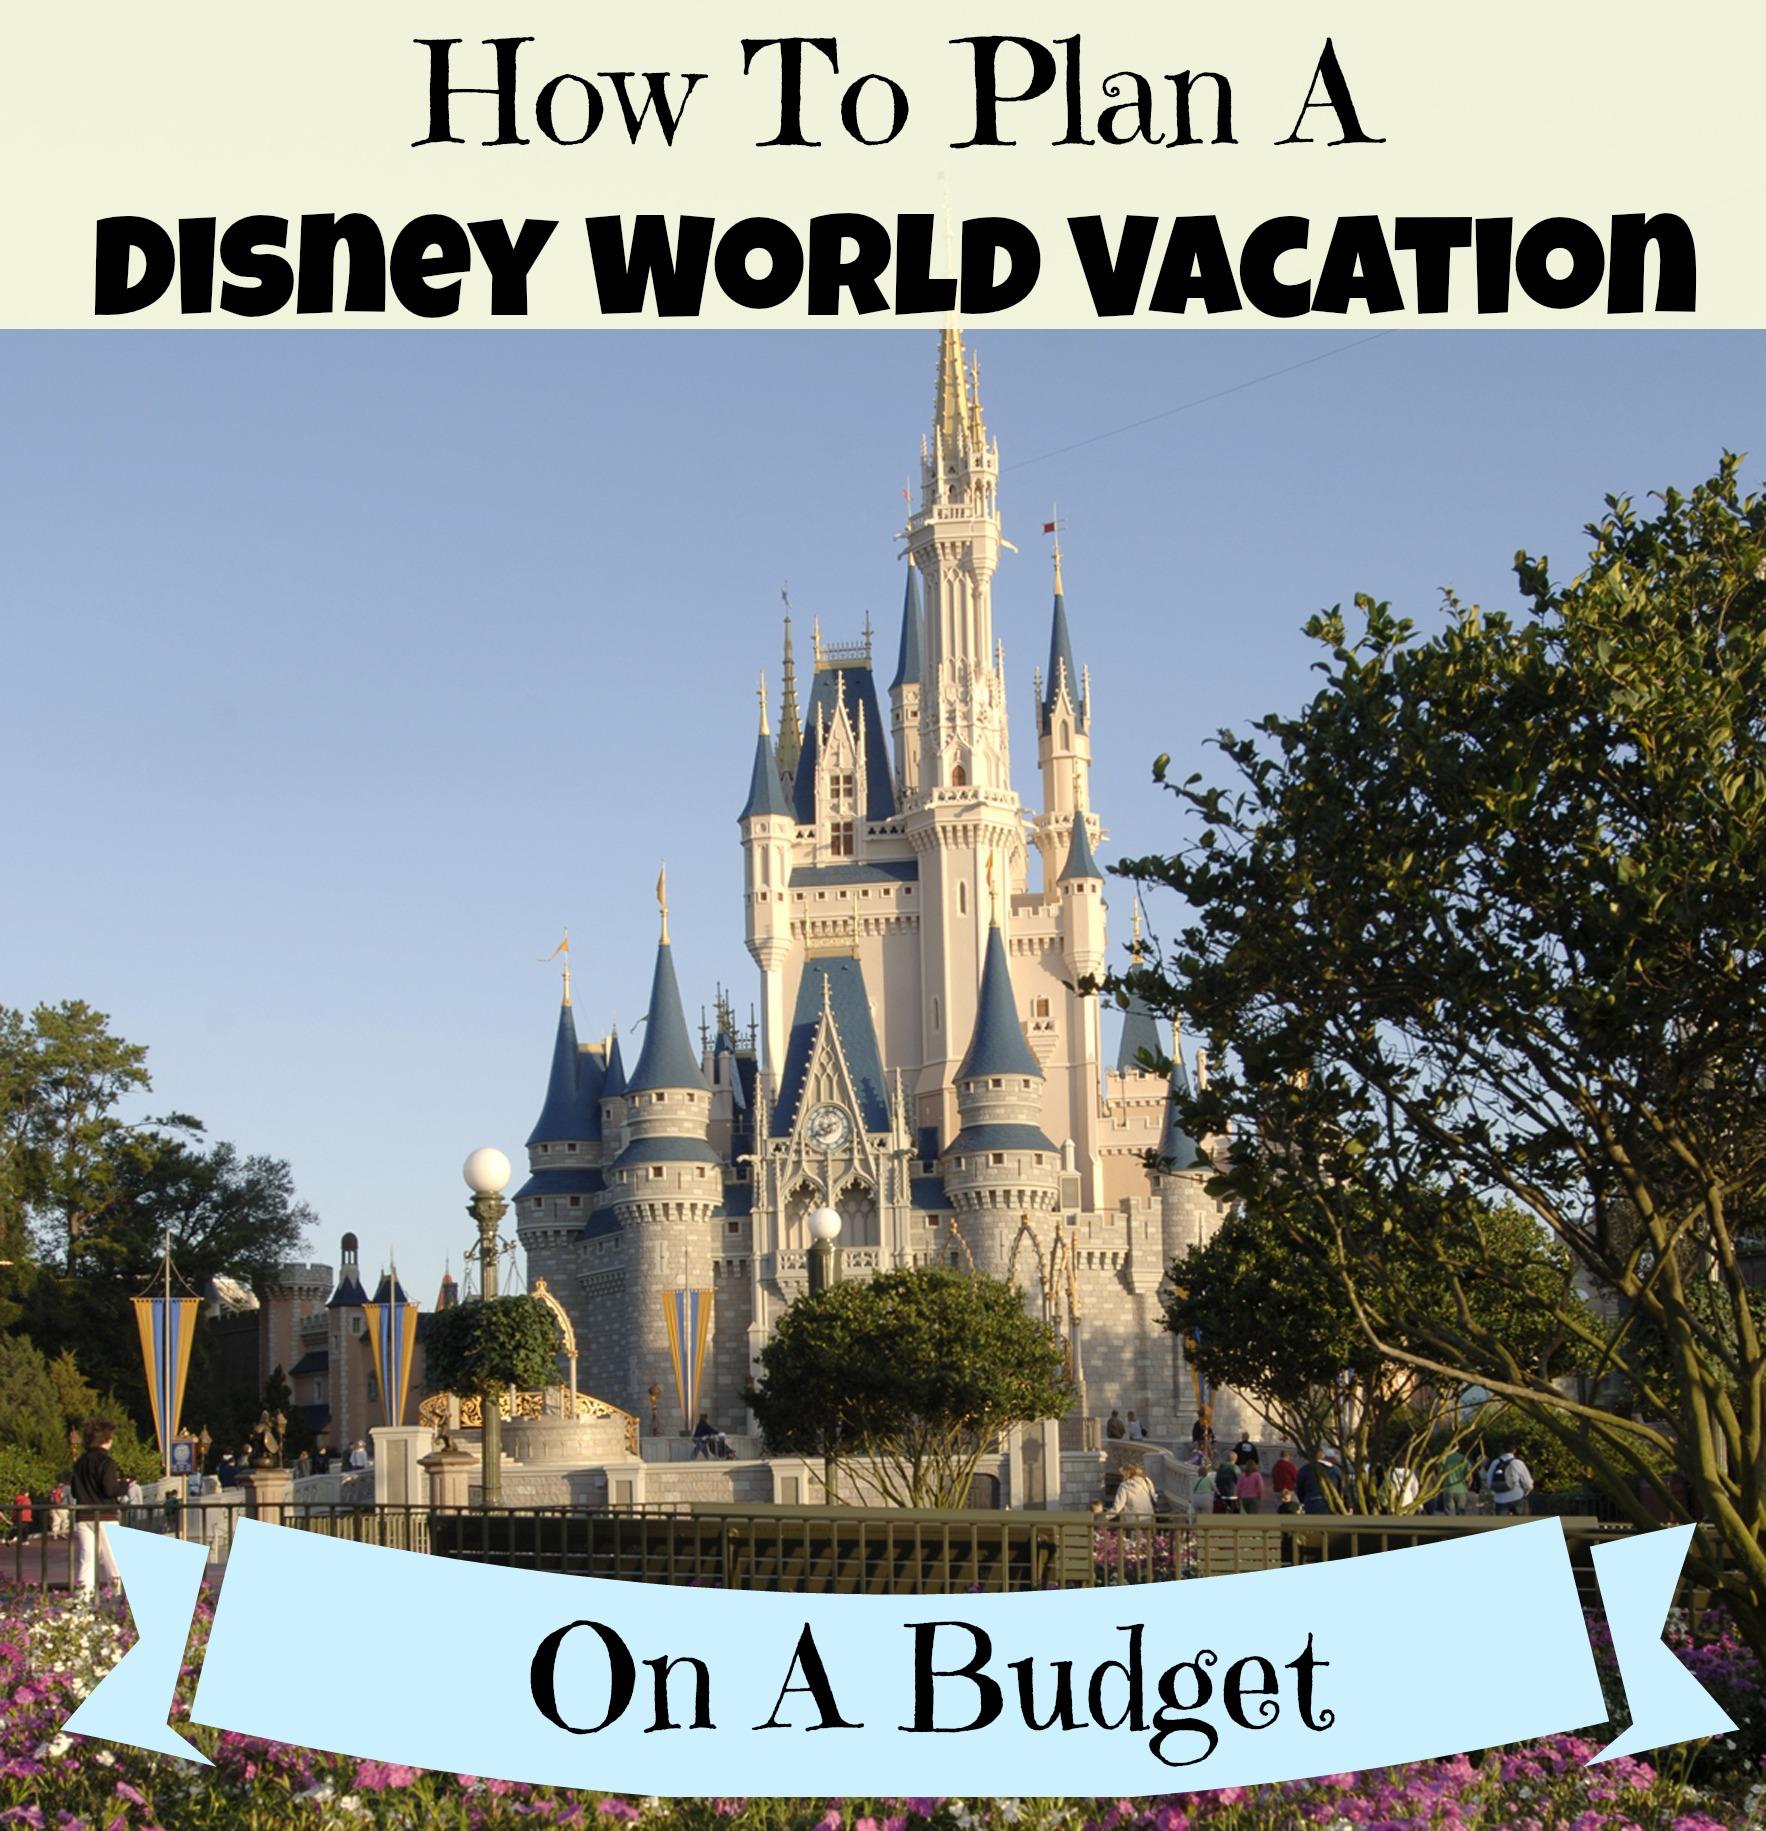 Disney World Vacation Quotes. QuotesGram